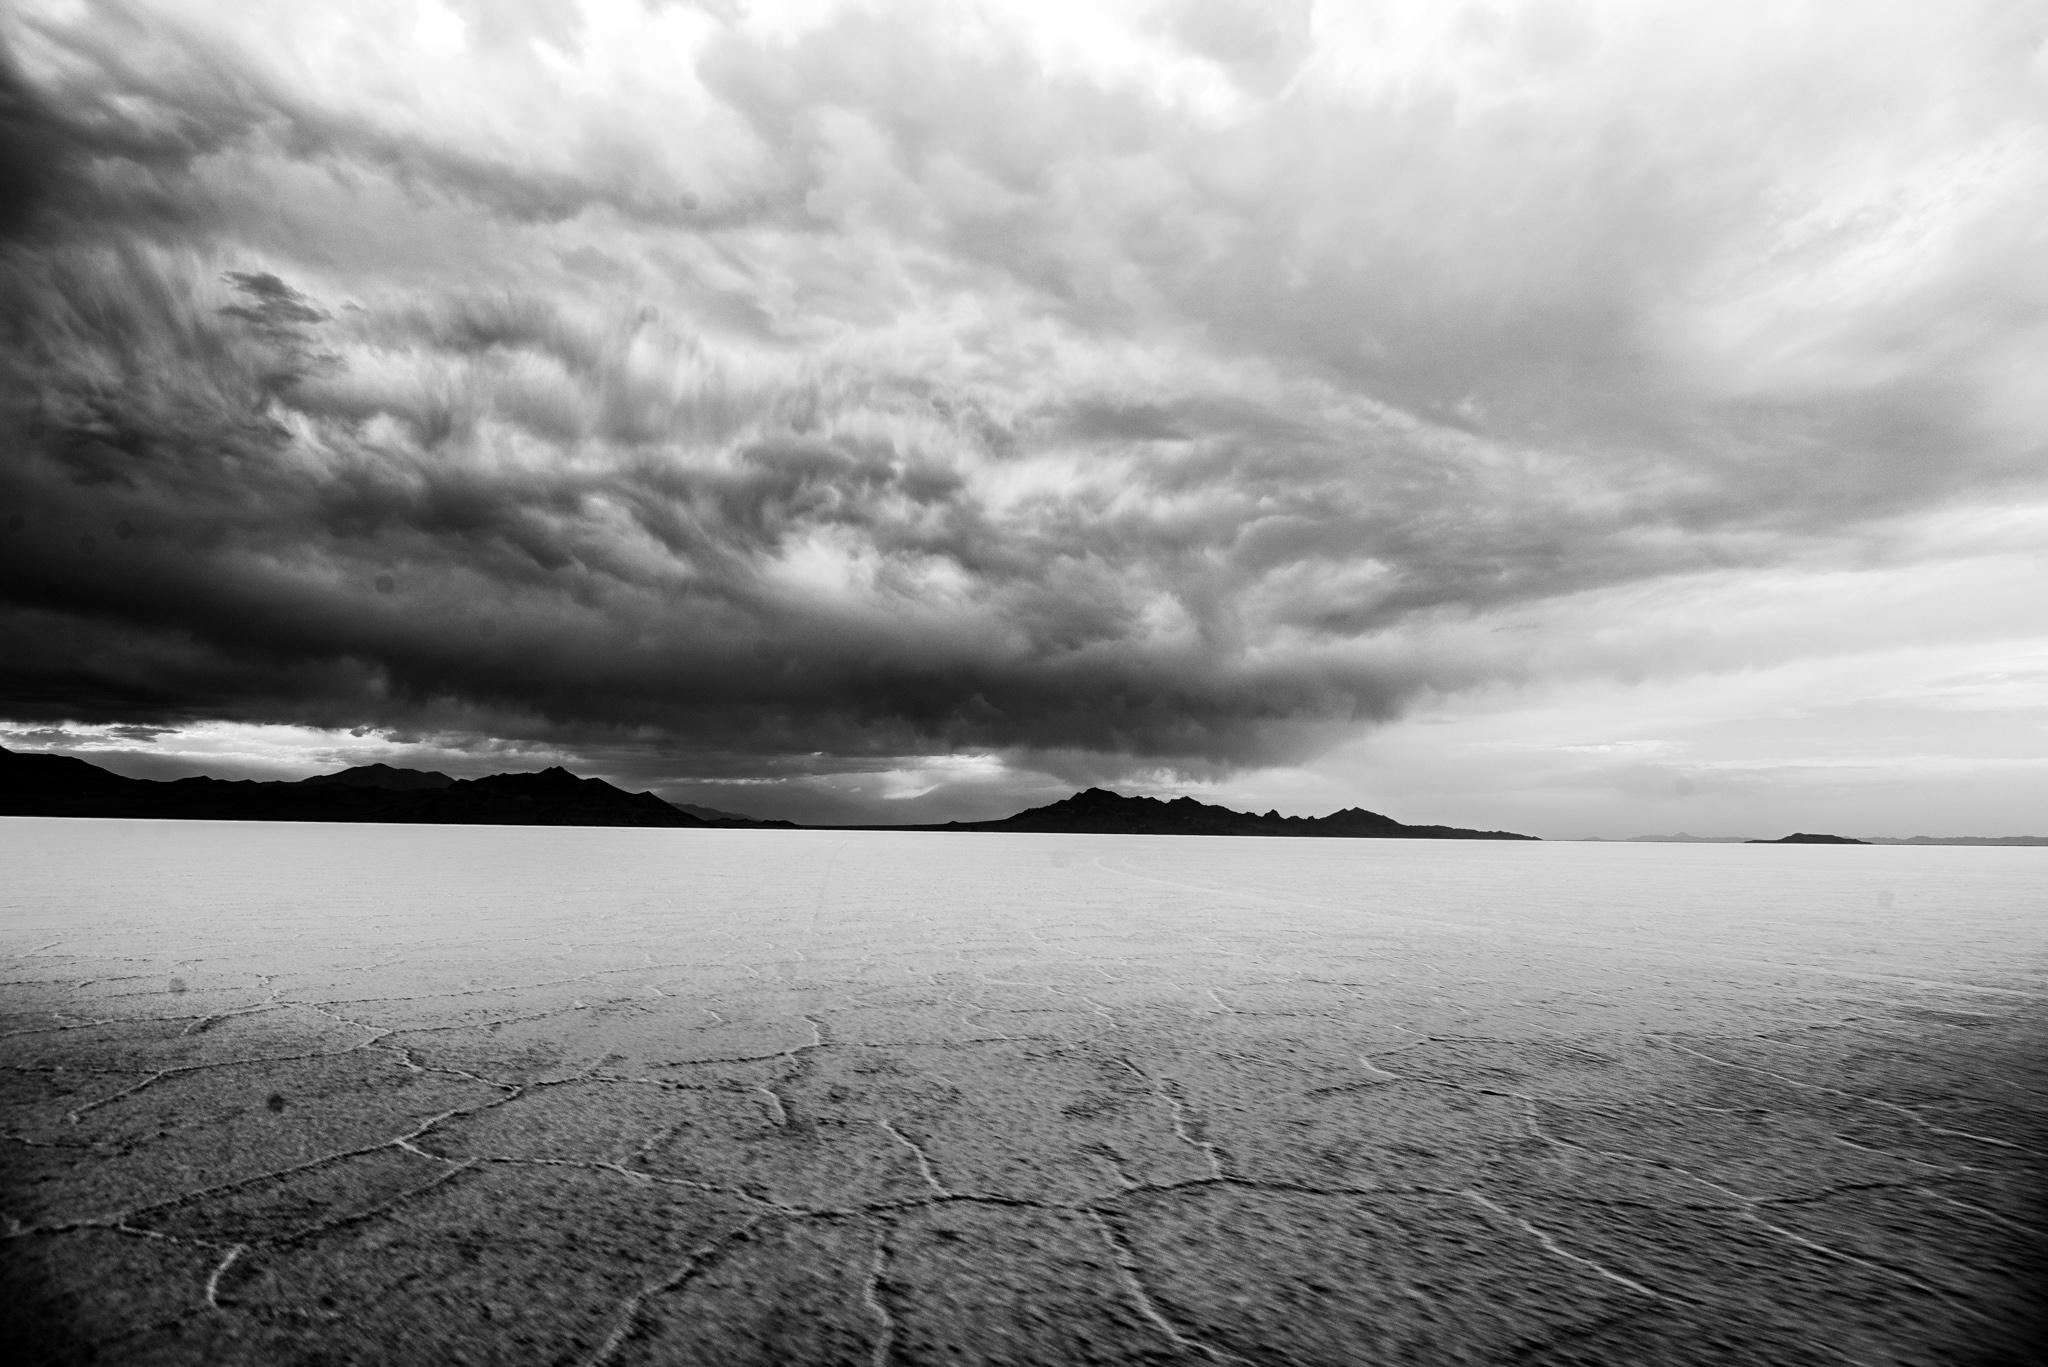 2017-07-08 - Bonneville Salt Flats - 204